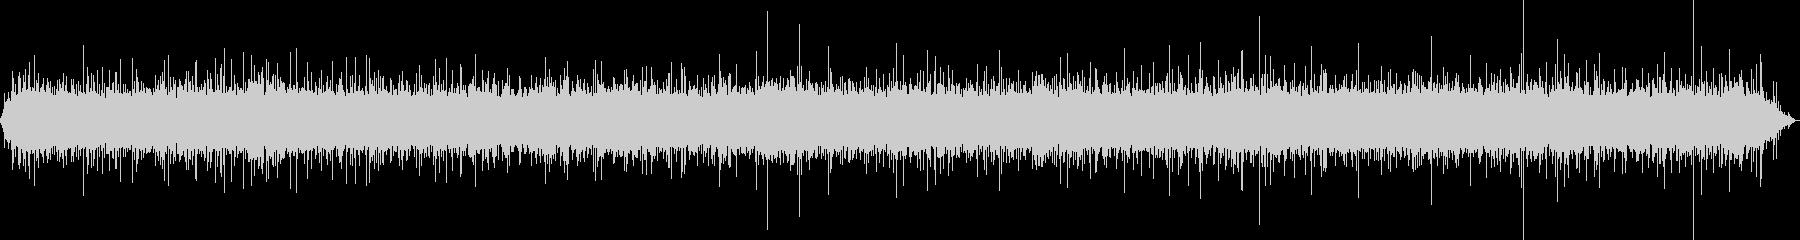 [Natural sound] waterfall 02 (Yamanashi)'s unreproduced waveform